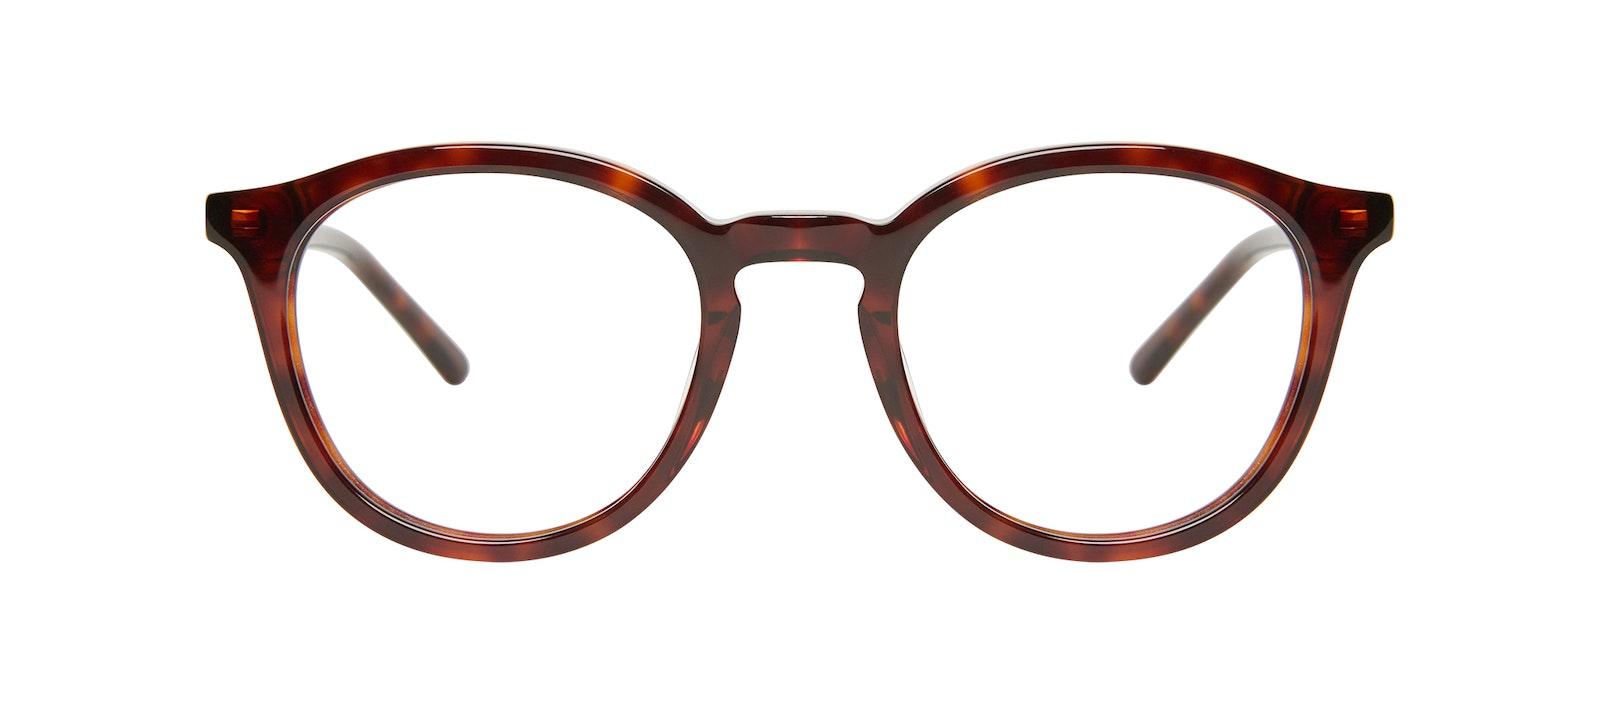 Affordable Fashion Glasses Round Eyeglasses Kids Gent Junior Tortoise Front